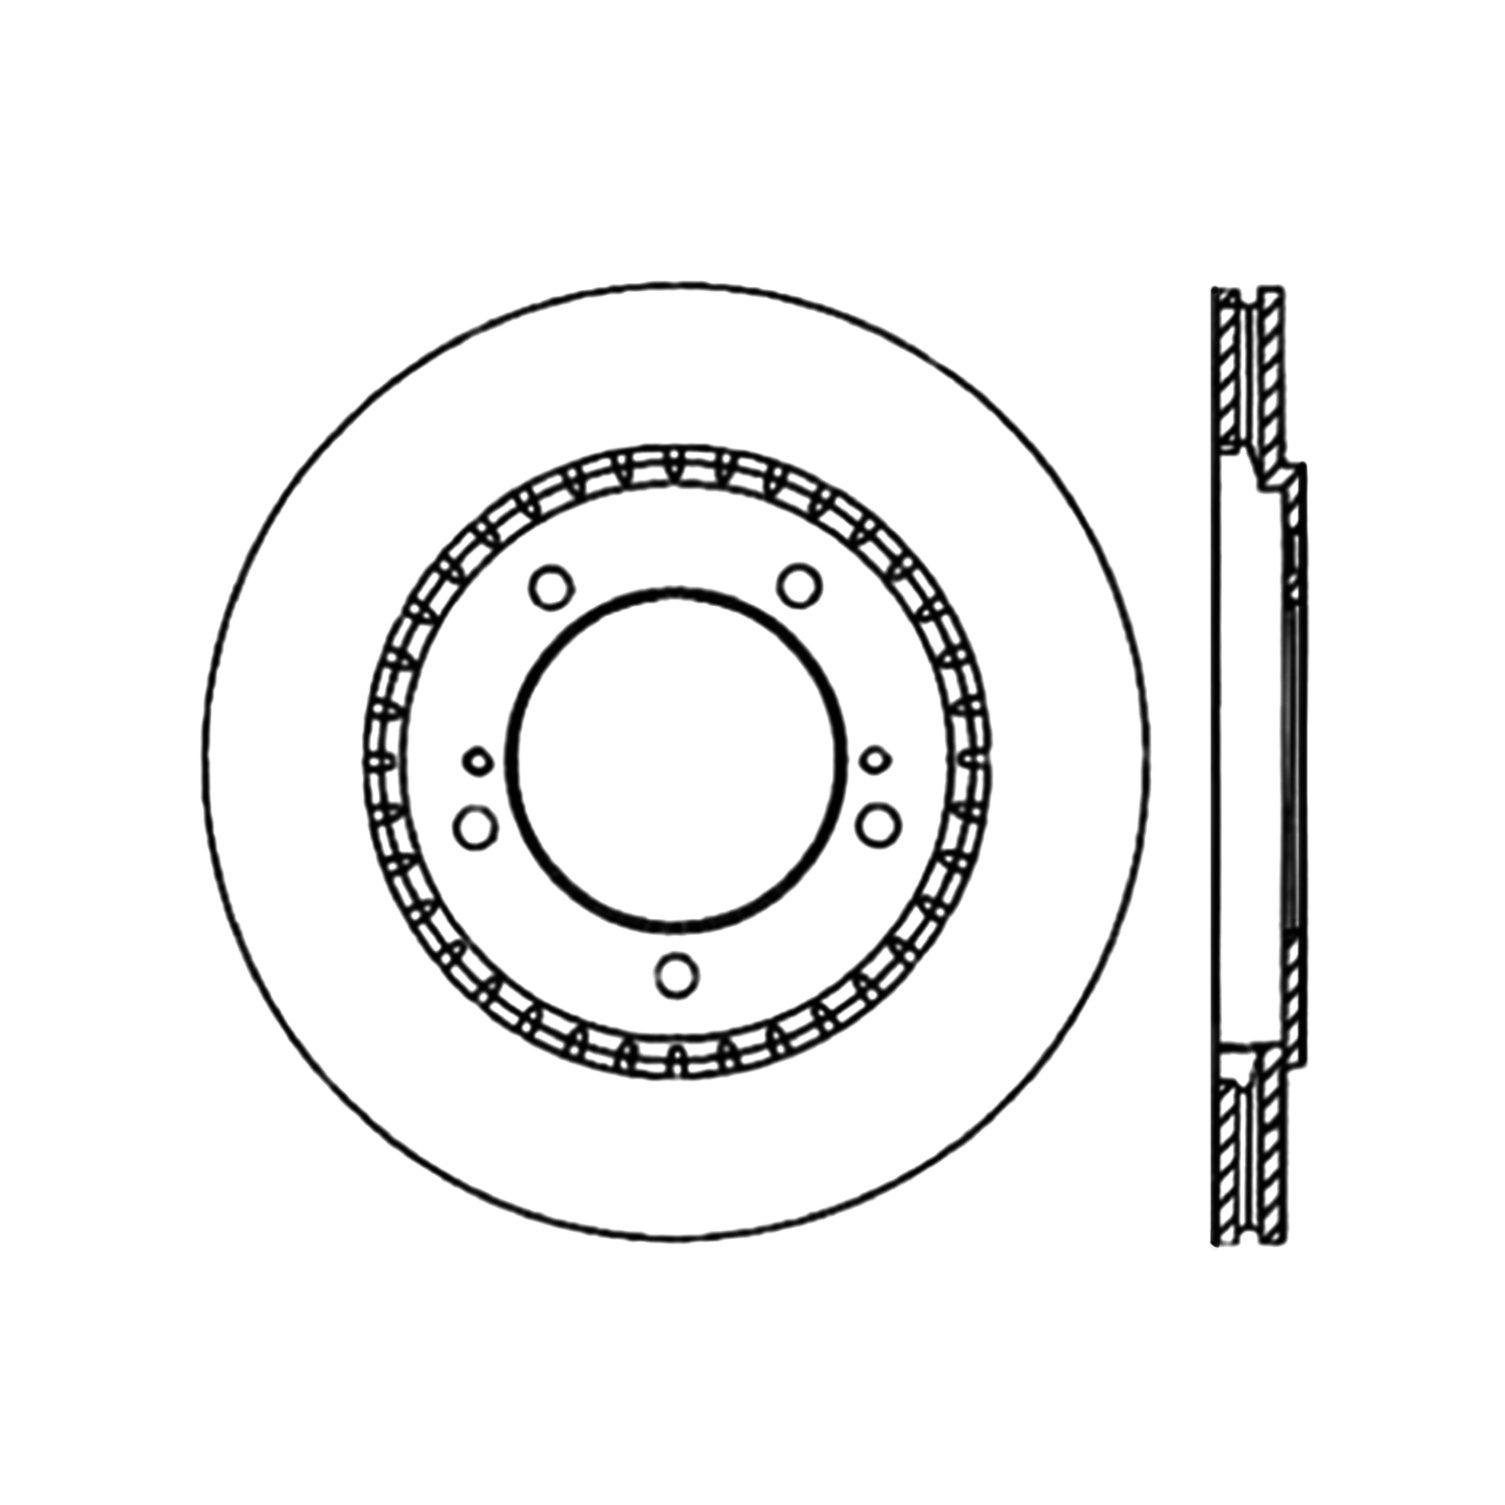 2003 suzuki grand vitara disc brake rotor autopartskart 1994 Buick Century Rear Drum Brakes 2003 suzuki grand vitara disc brake rotor ce 120 48008